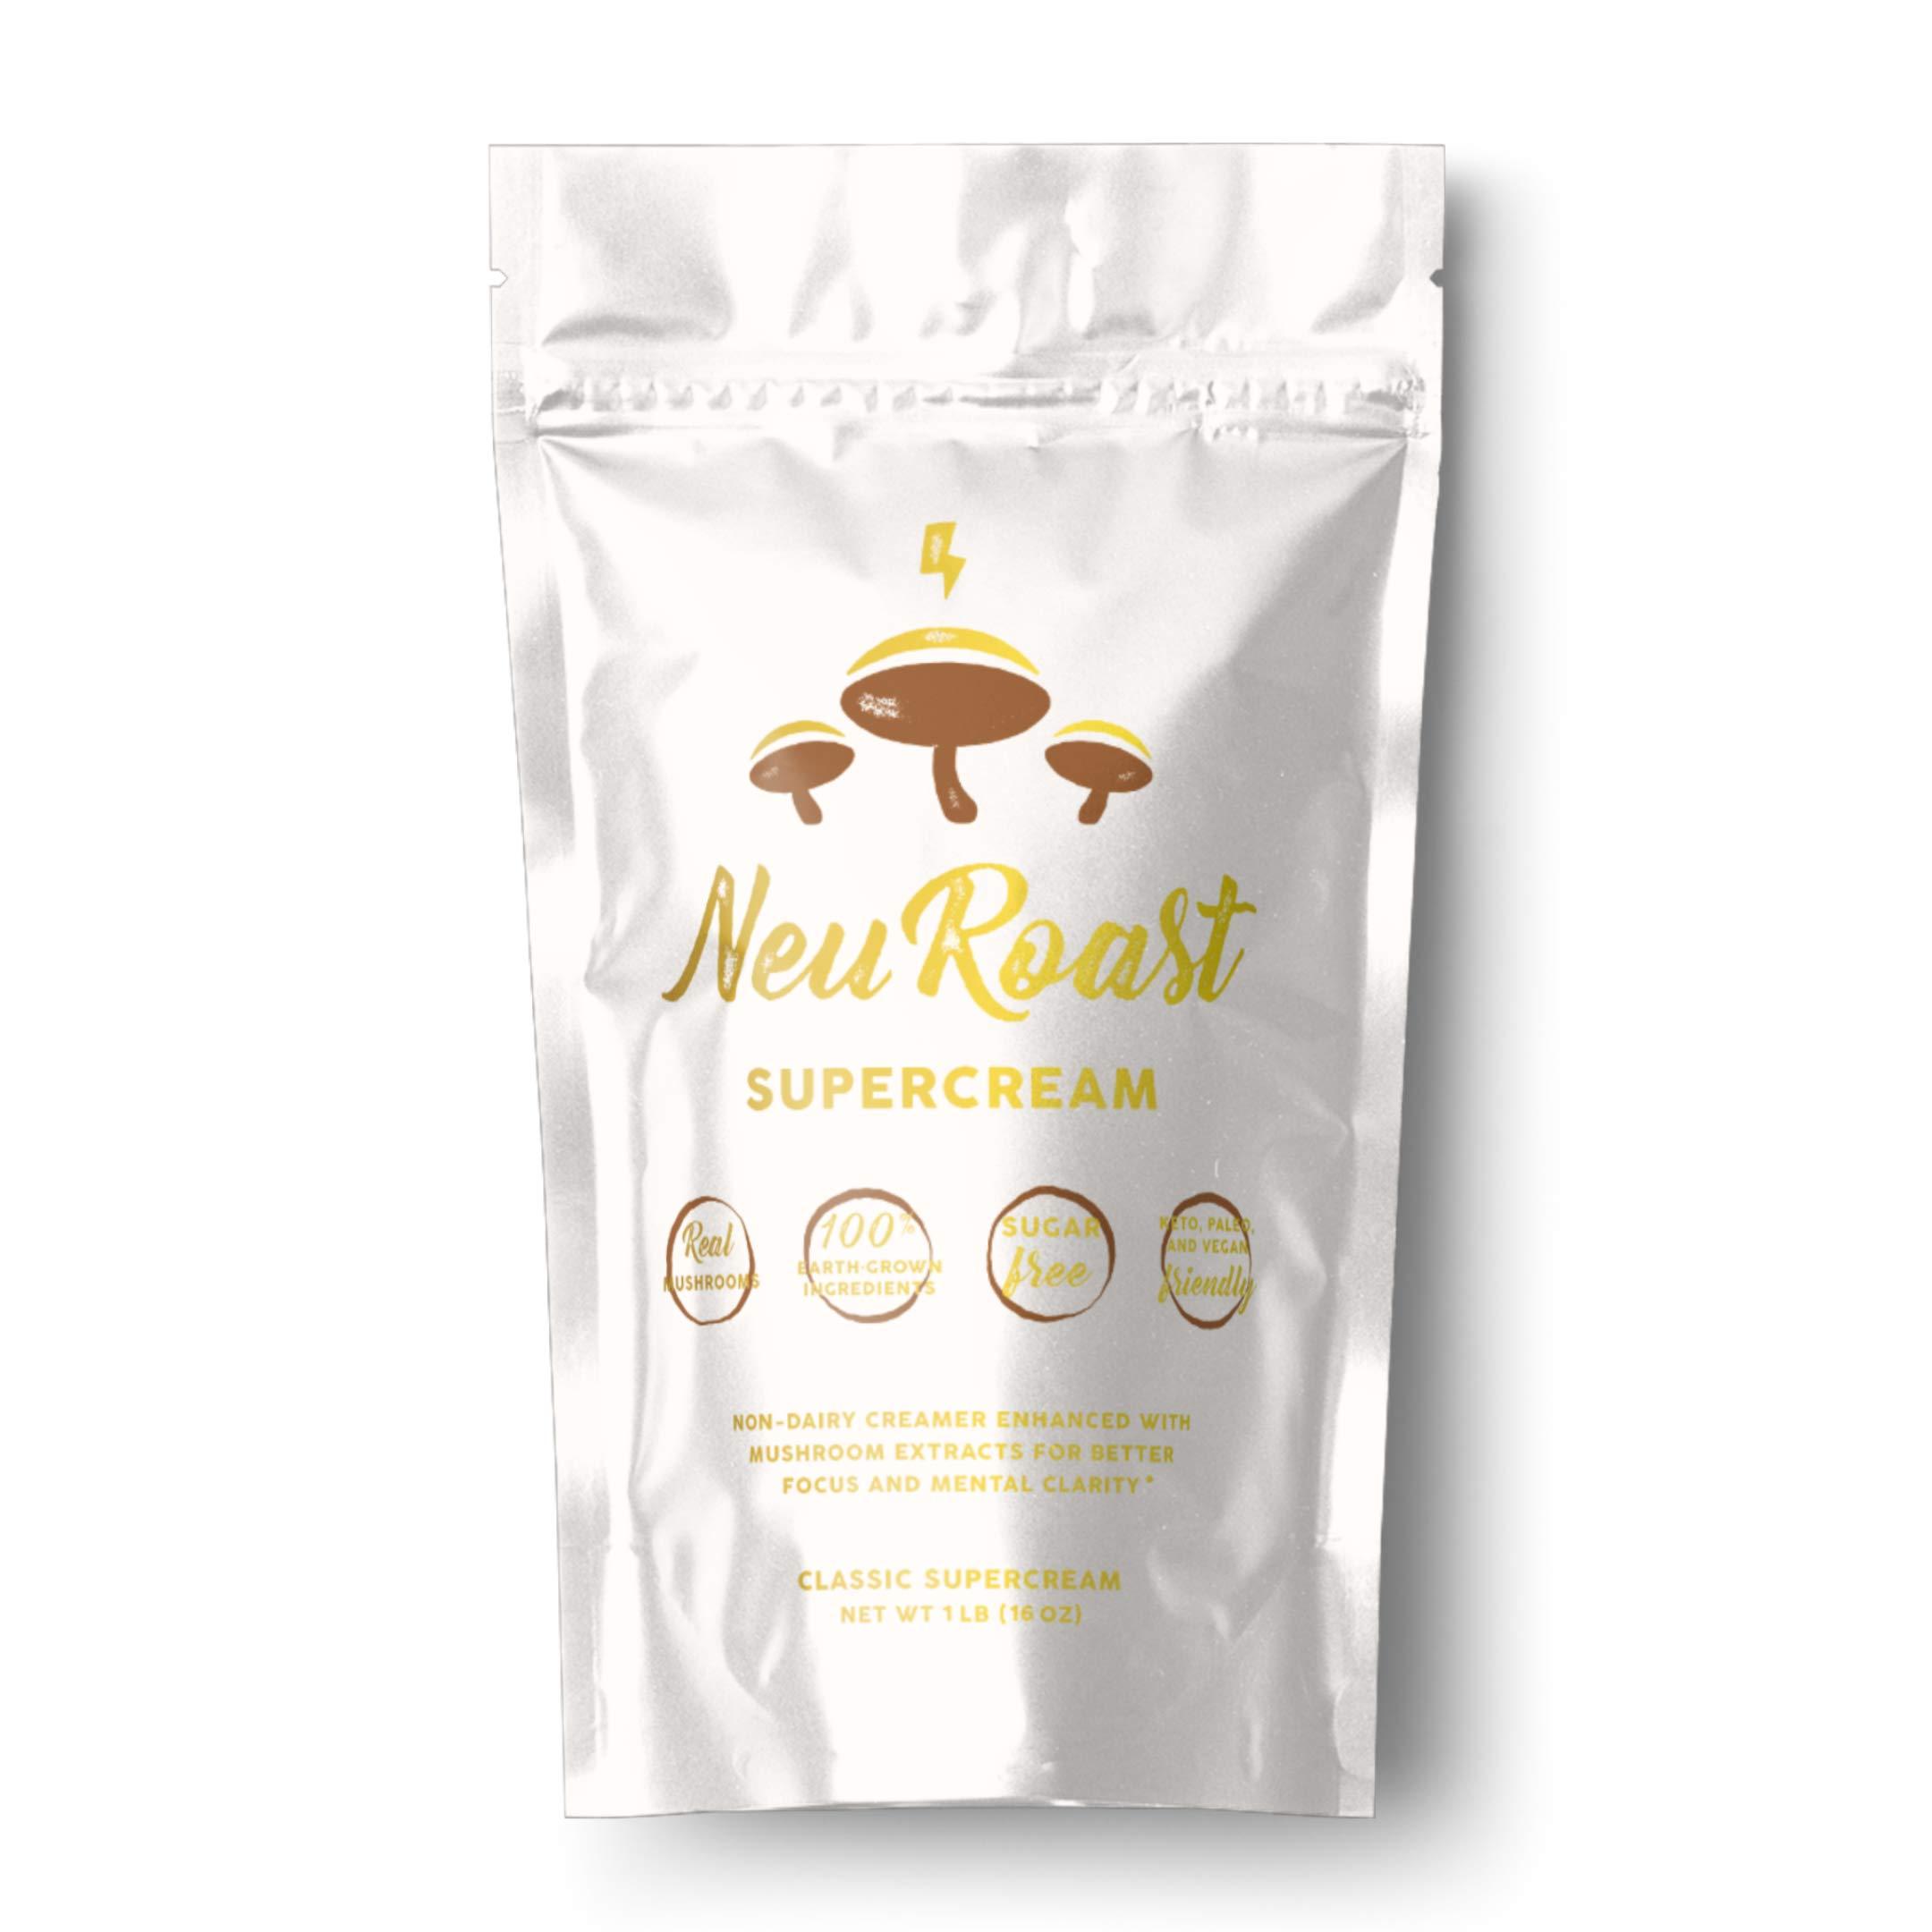 NeuRoast Coffee Creamer - Keto Coffee Creamer with Lion's Mane and Chaga | Sugar-Free, Gluten-Free, GMO-Free | Vegan-Friendly, Paleo, and Keto by NeuRoast